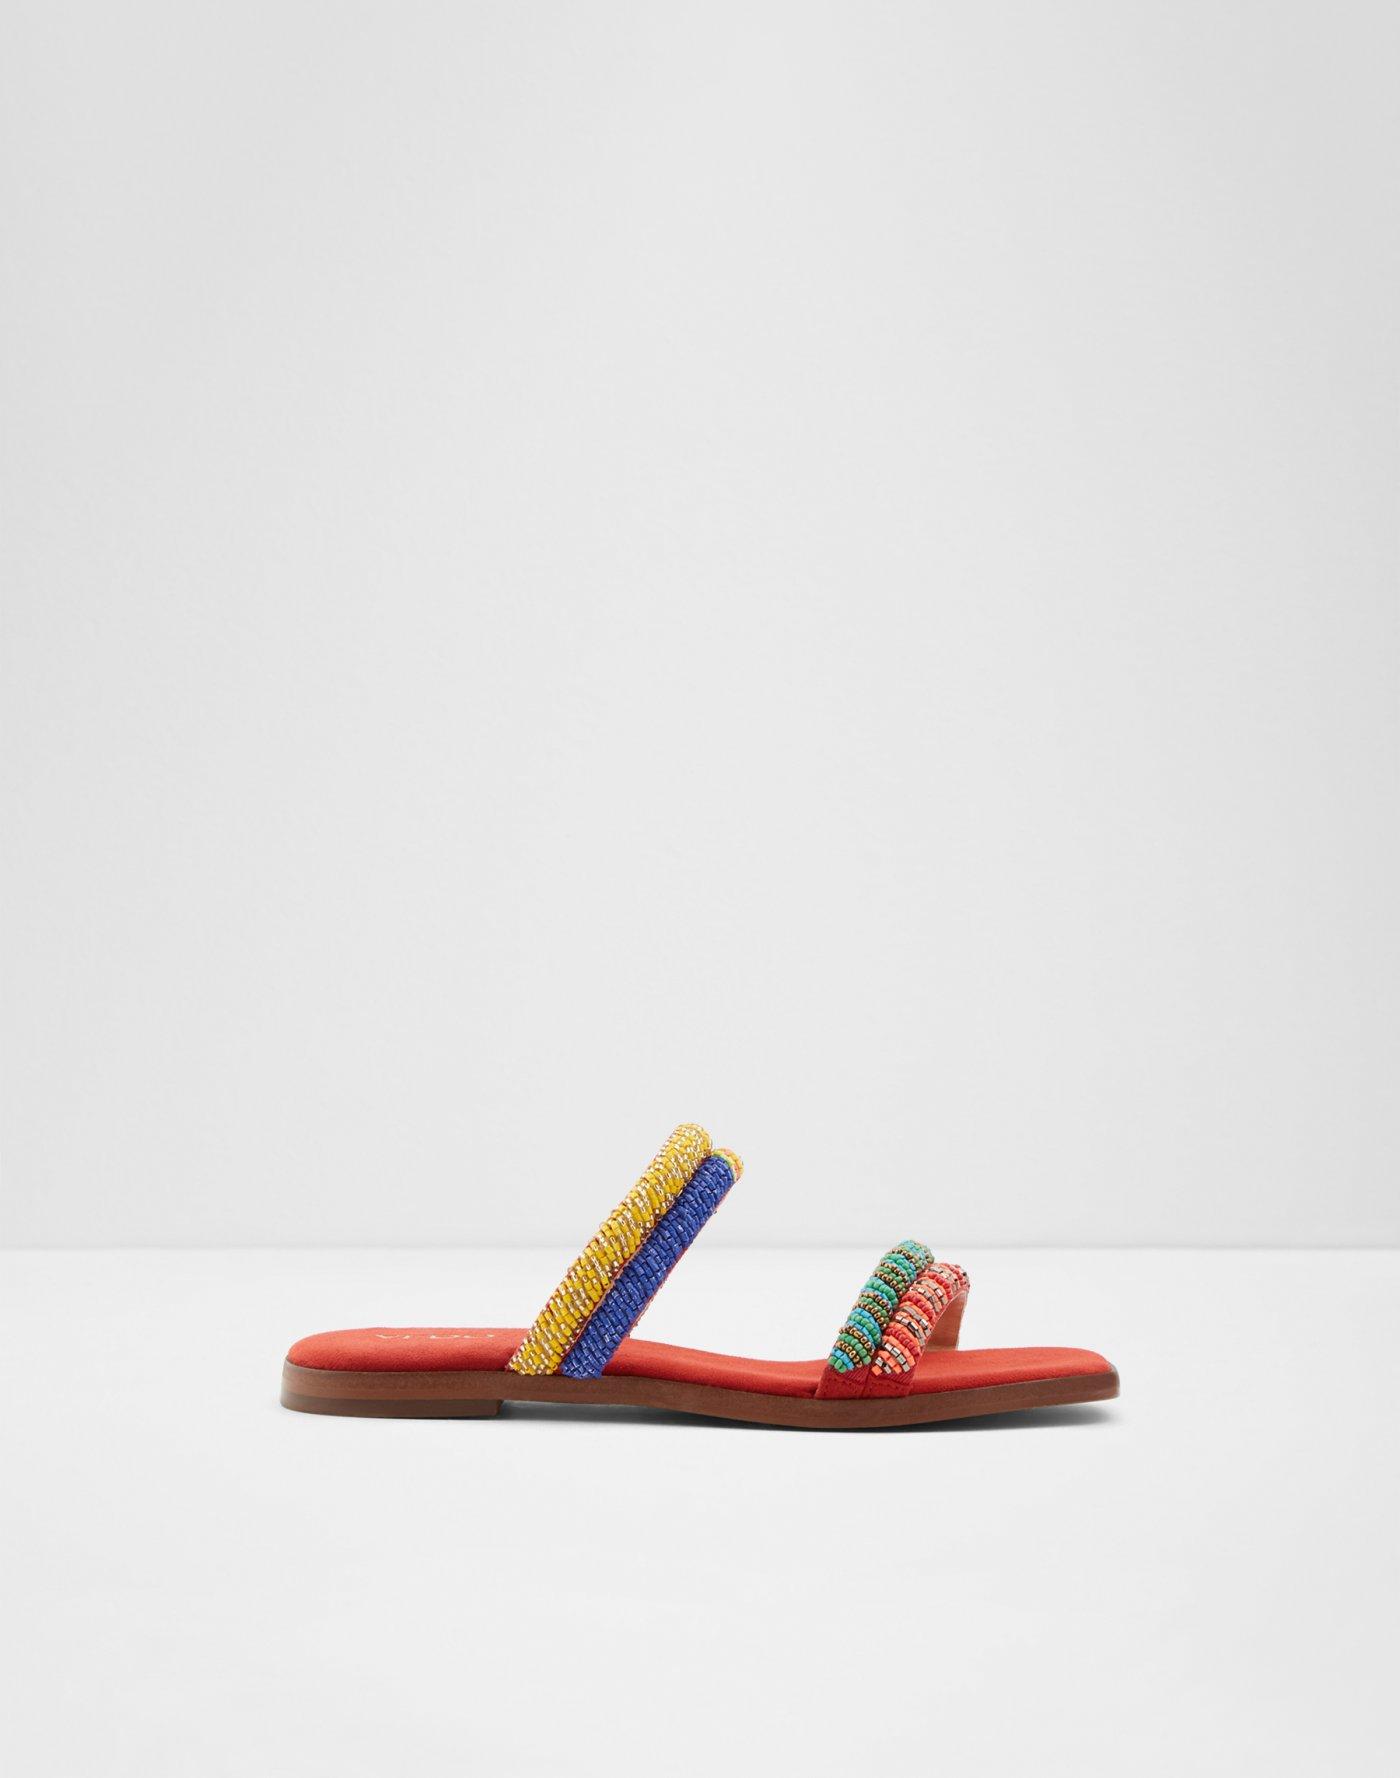 64e67012c398 Sandals